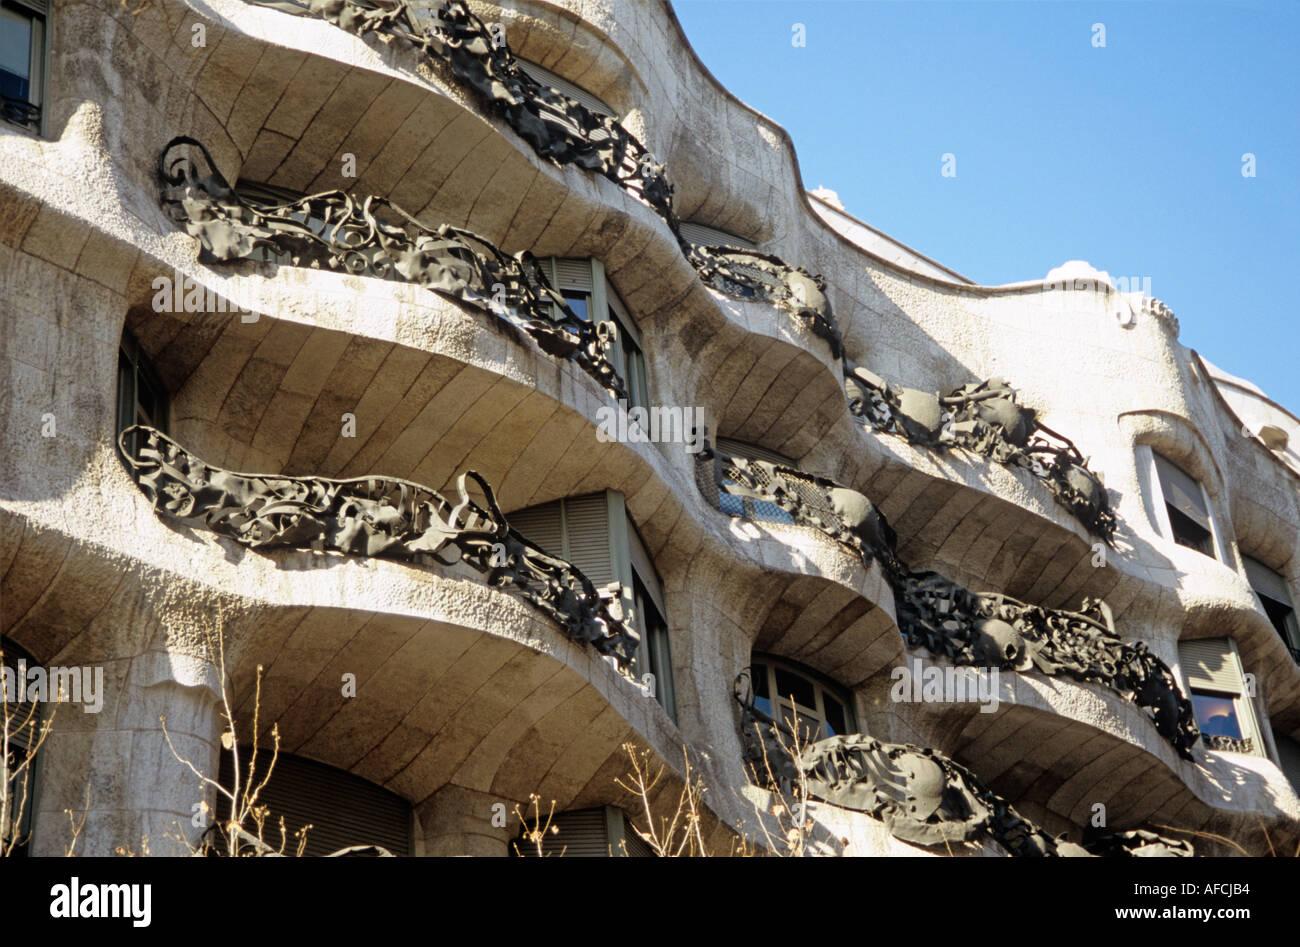 A triumph of Antoni Gaudí is Casa Mila or La Pedrera in Barcelona - Stock Image